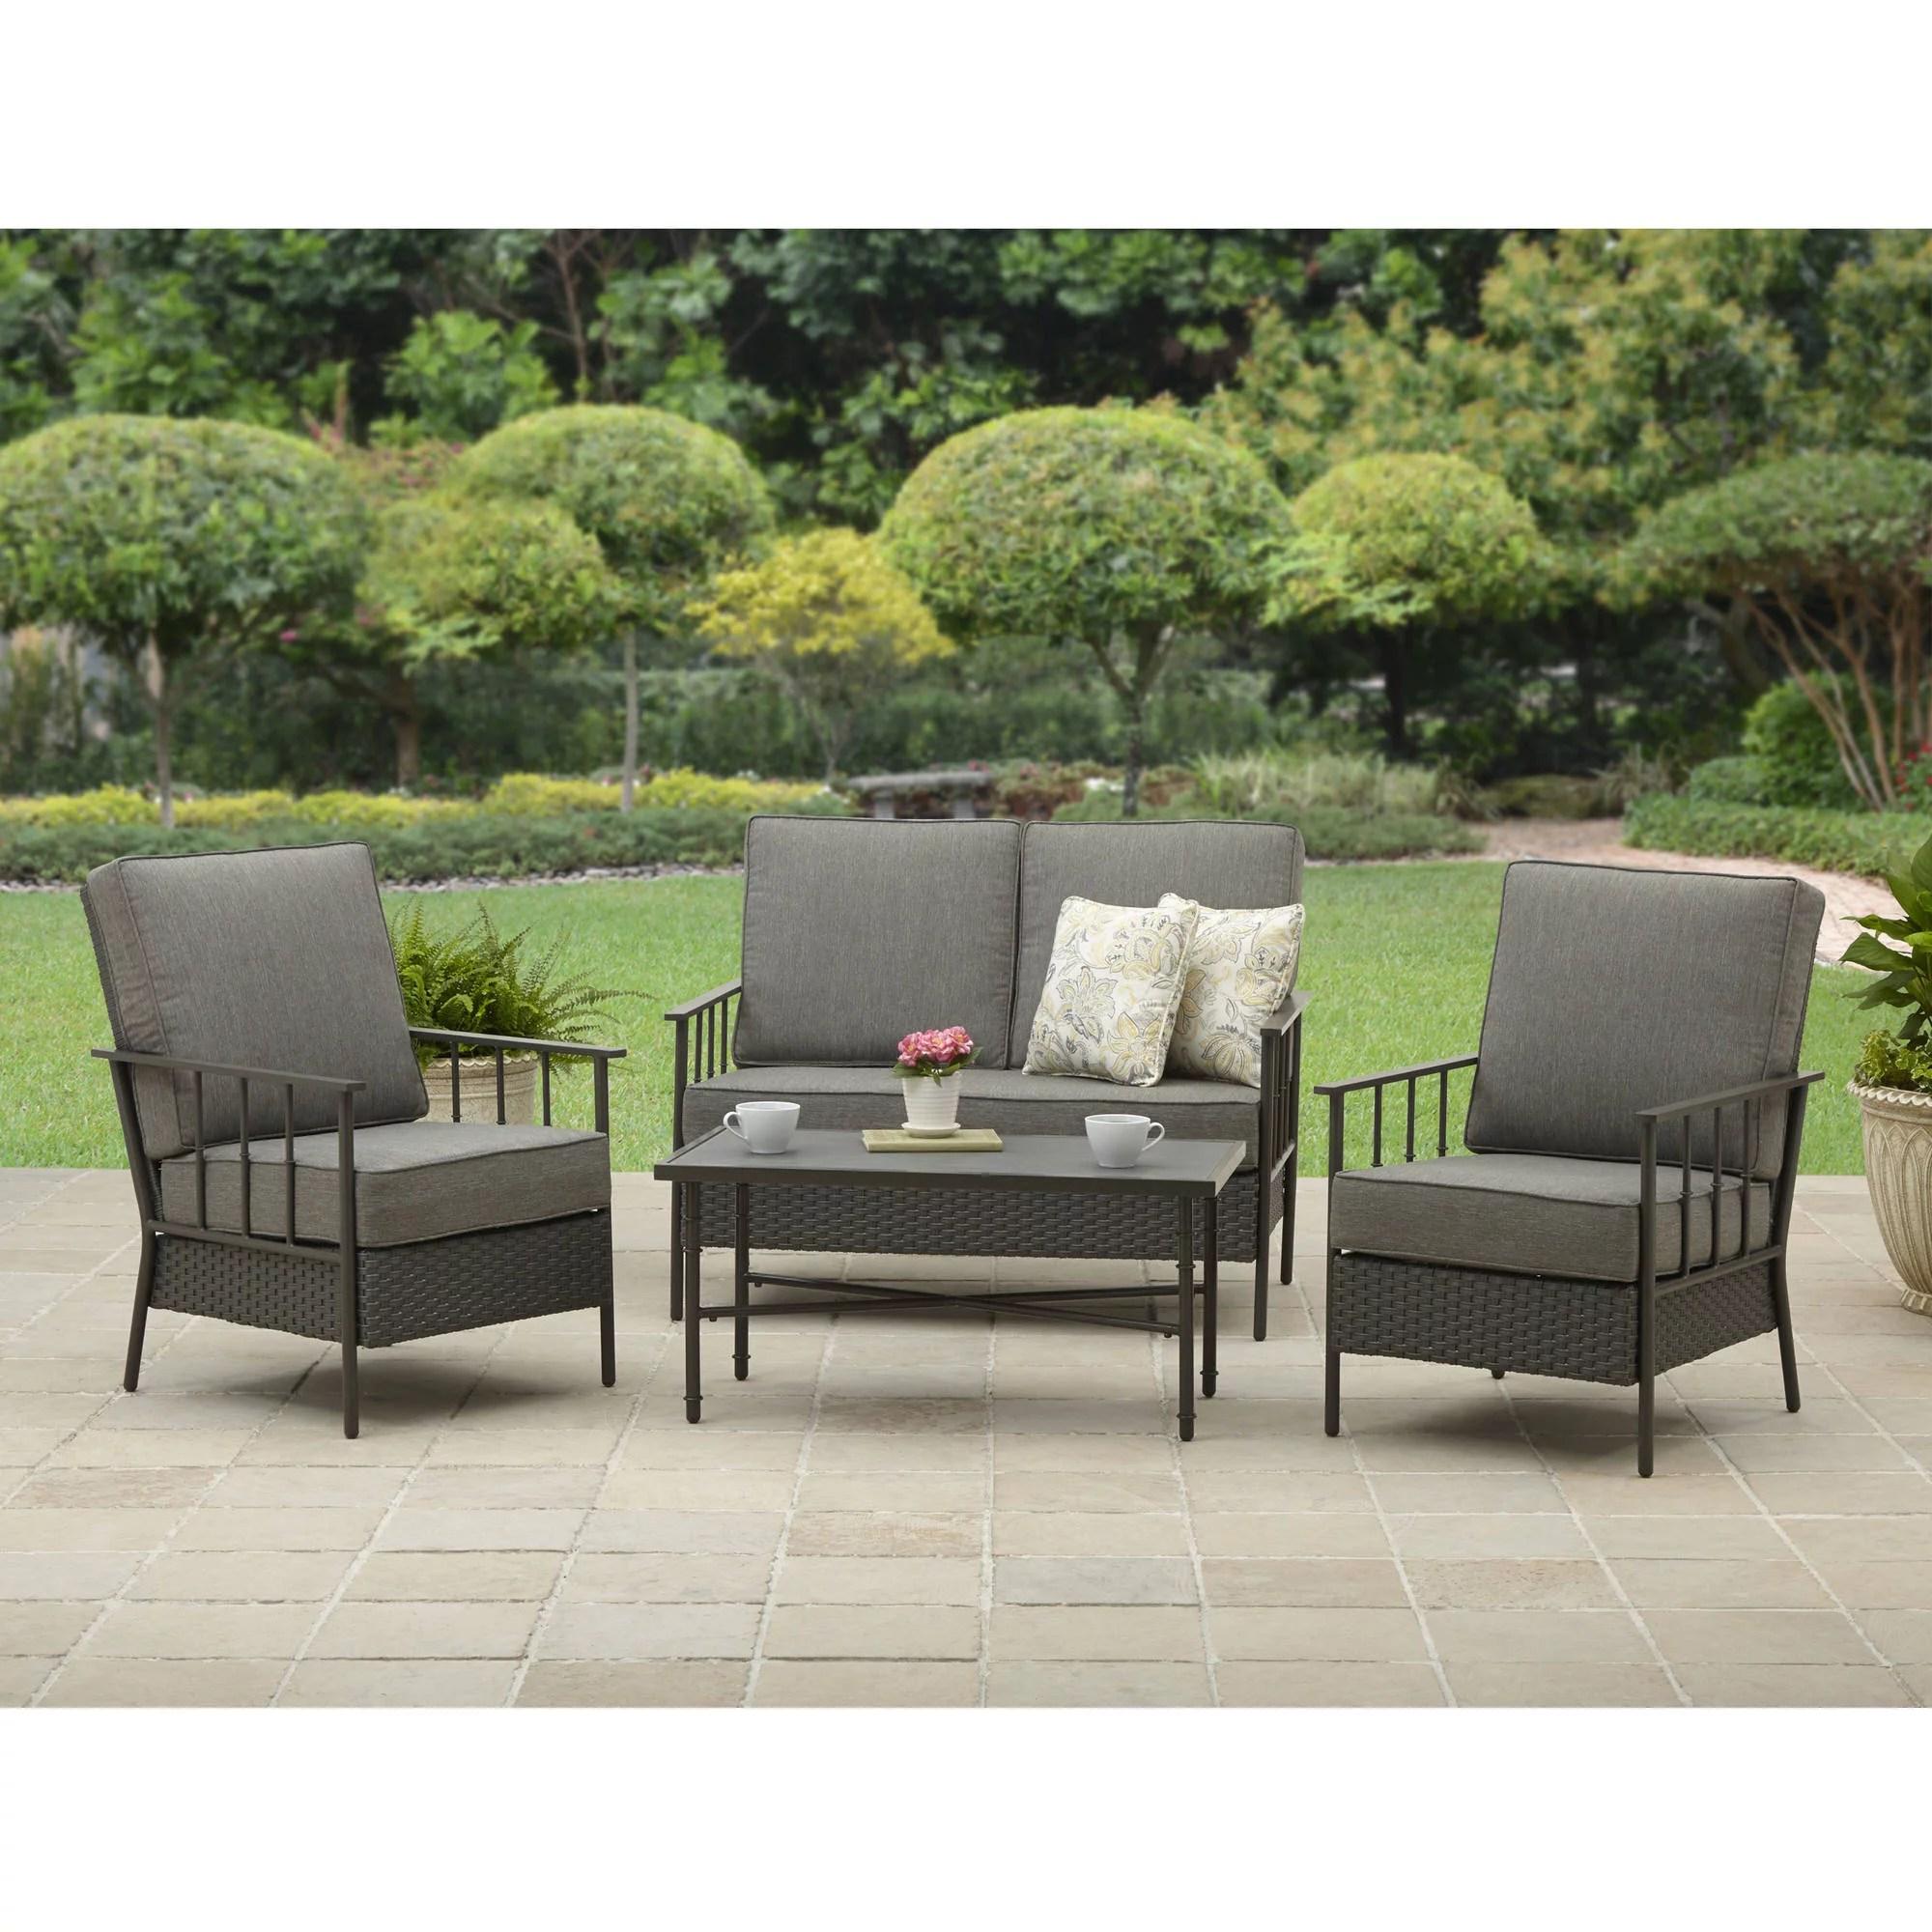 better homes and garden fairwater 4 piece outdoor conversation set walmart com